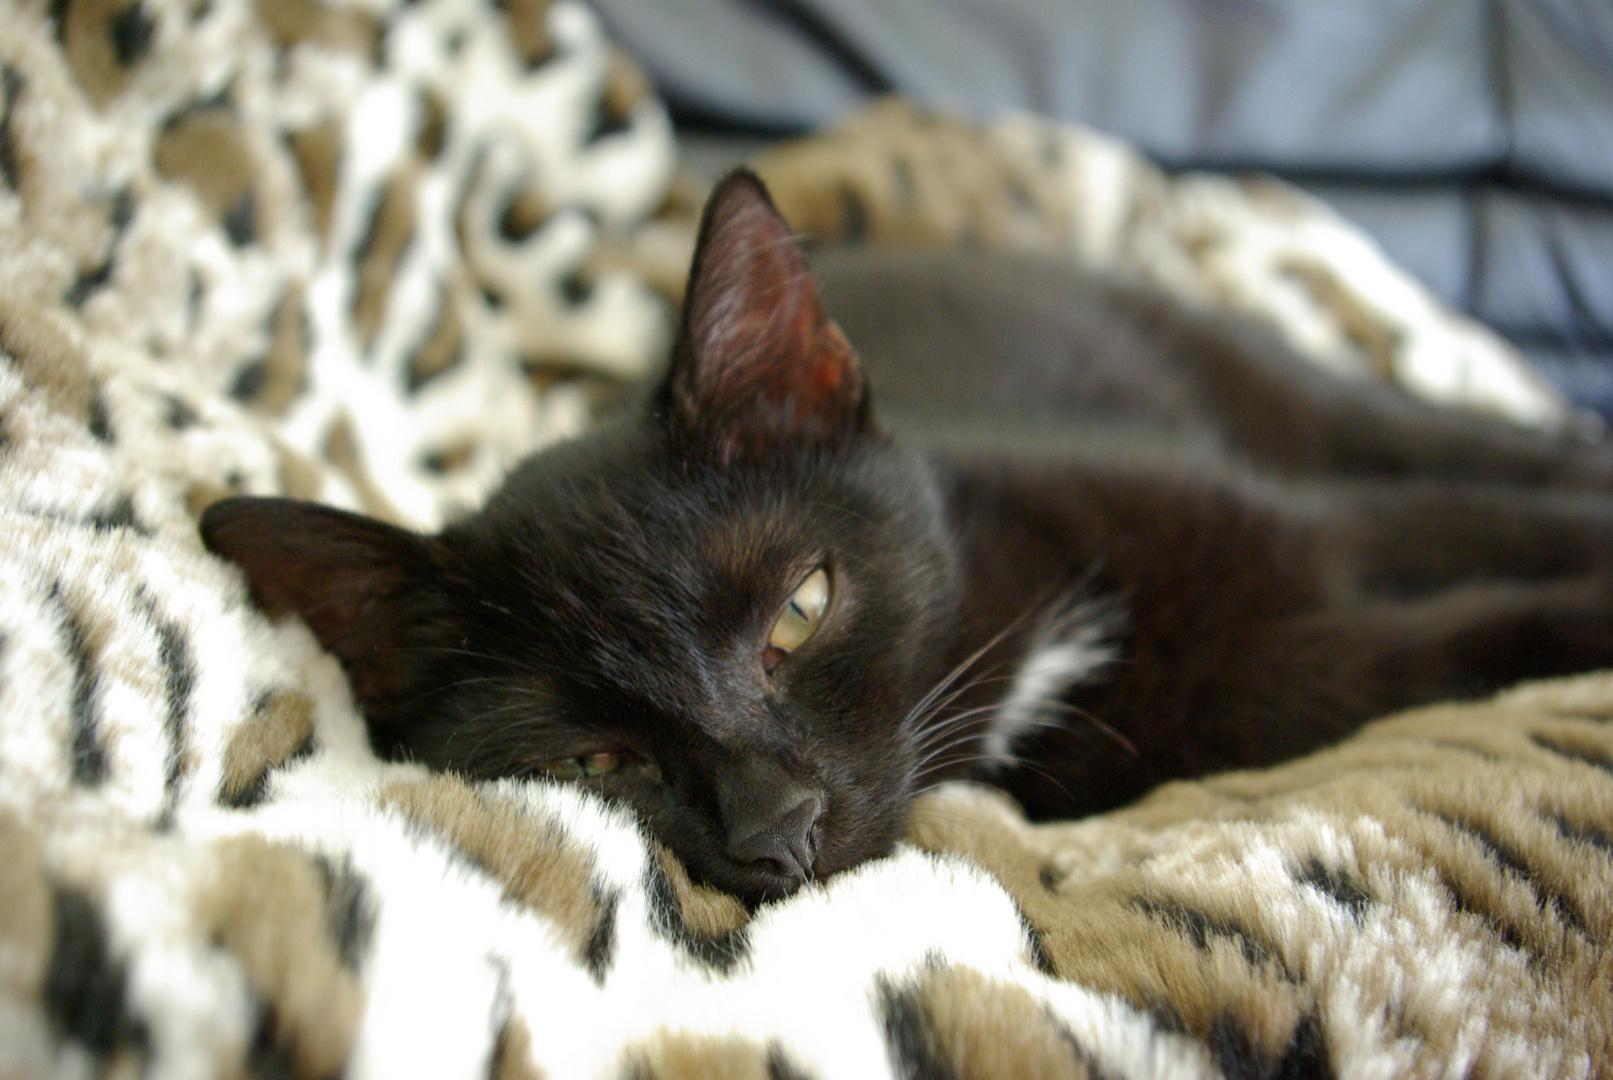 Kiki the cat